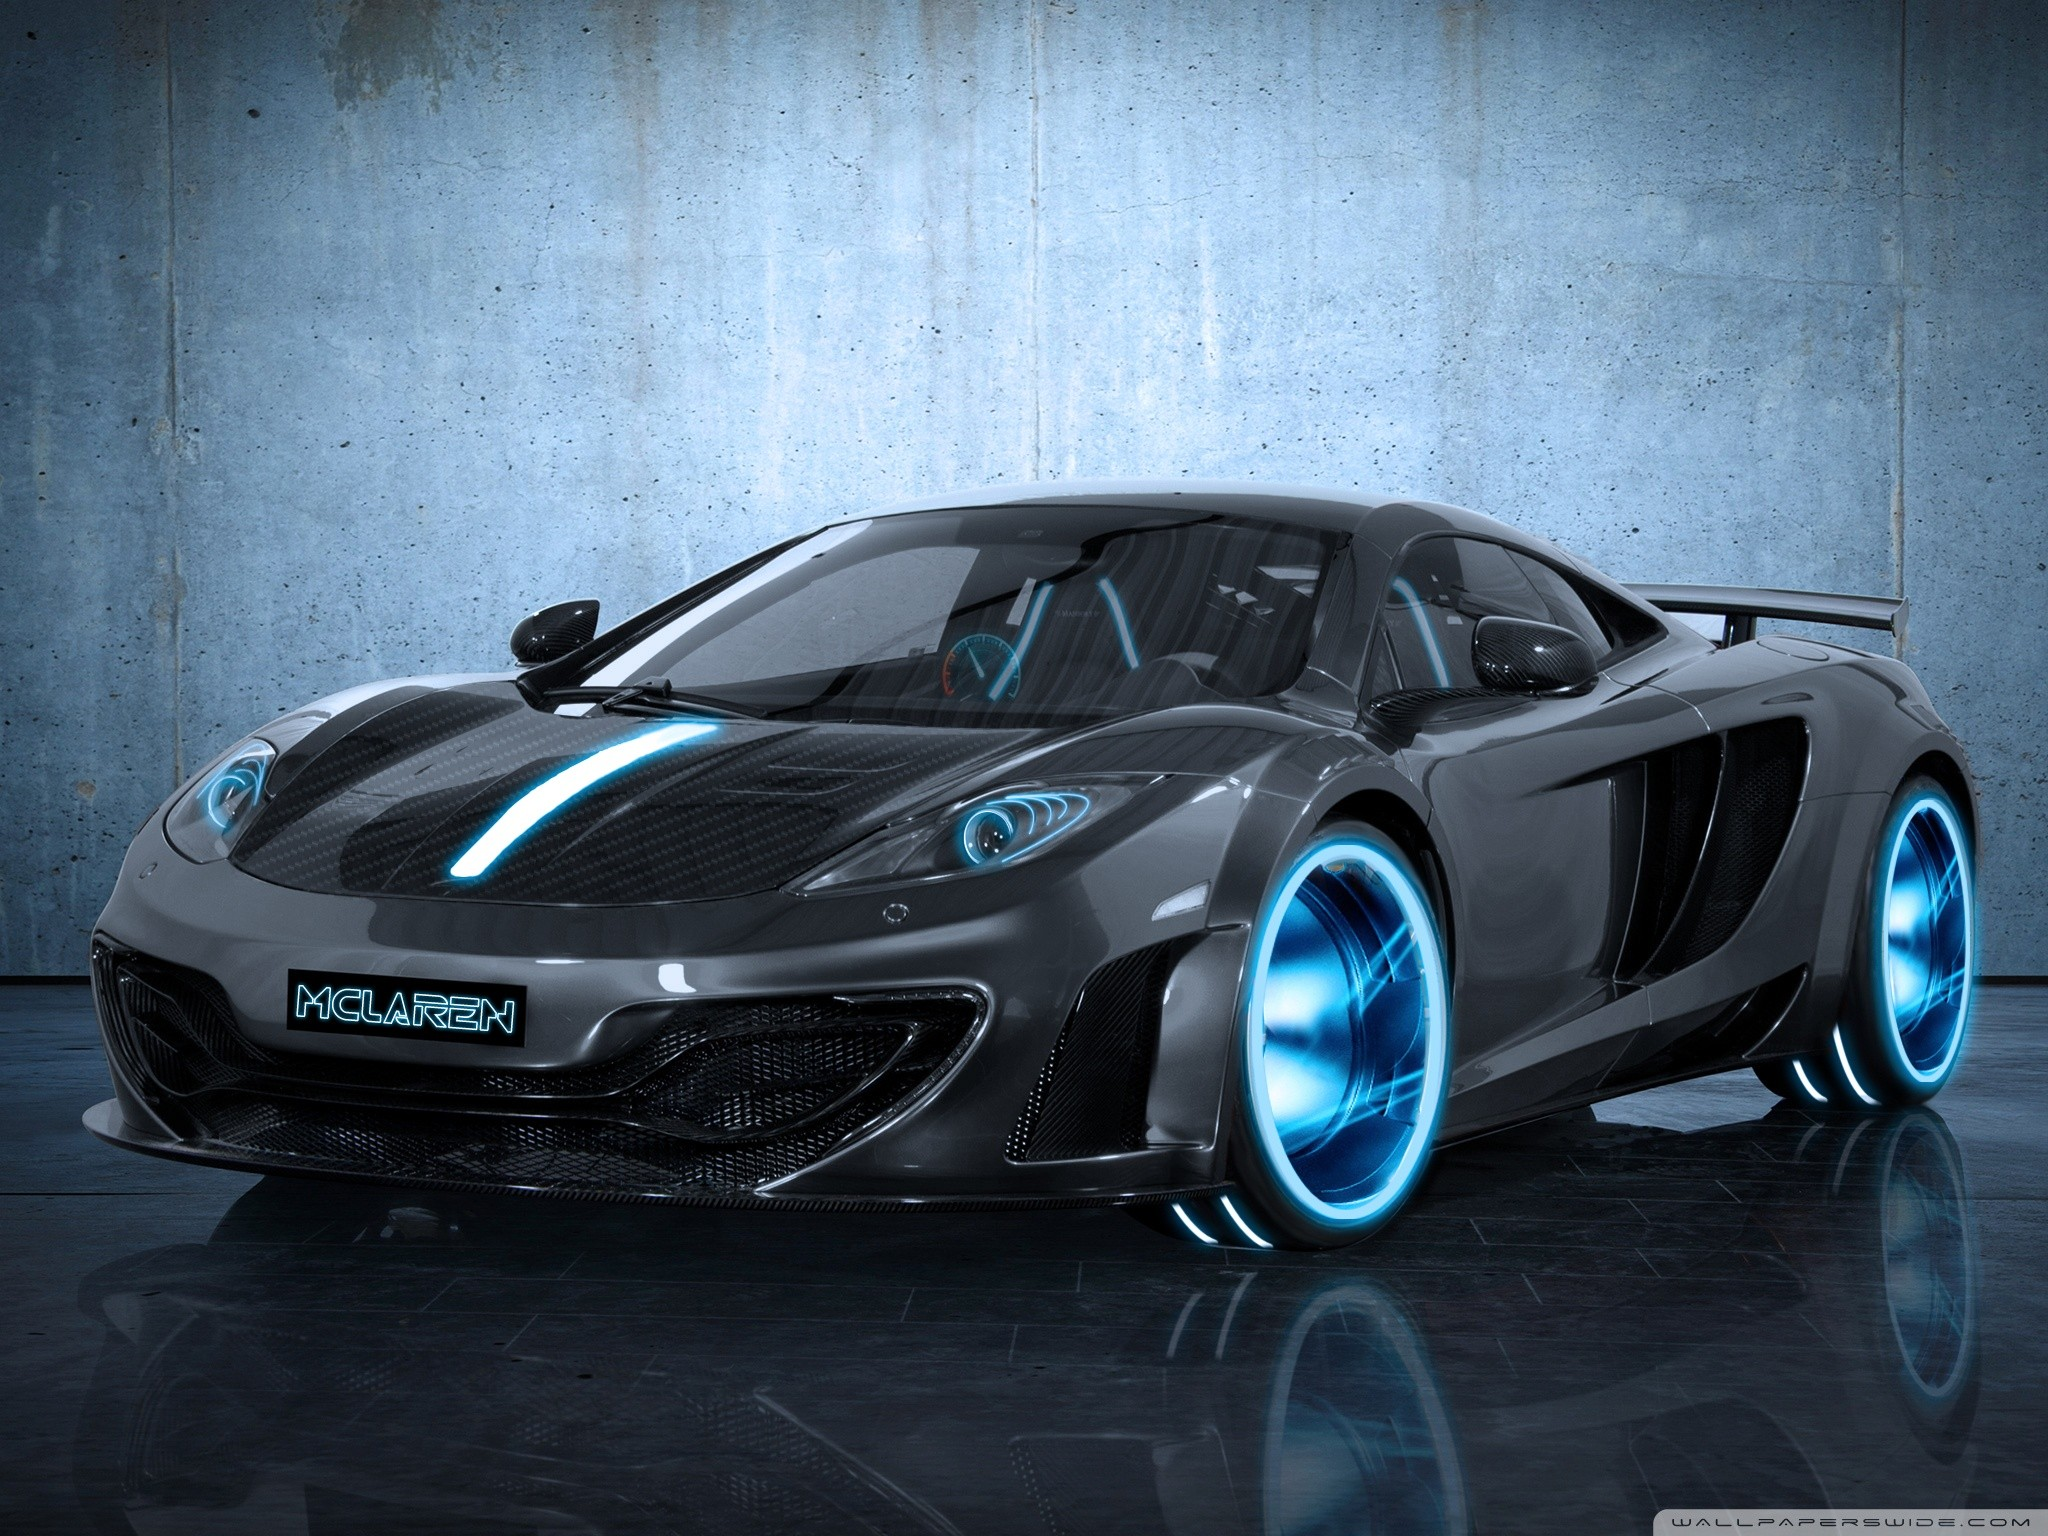 Download Cars McLaren Wallpaper 2048x1536 Wallpoper 393145 2048x1536